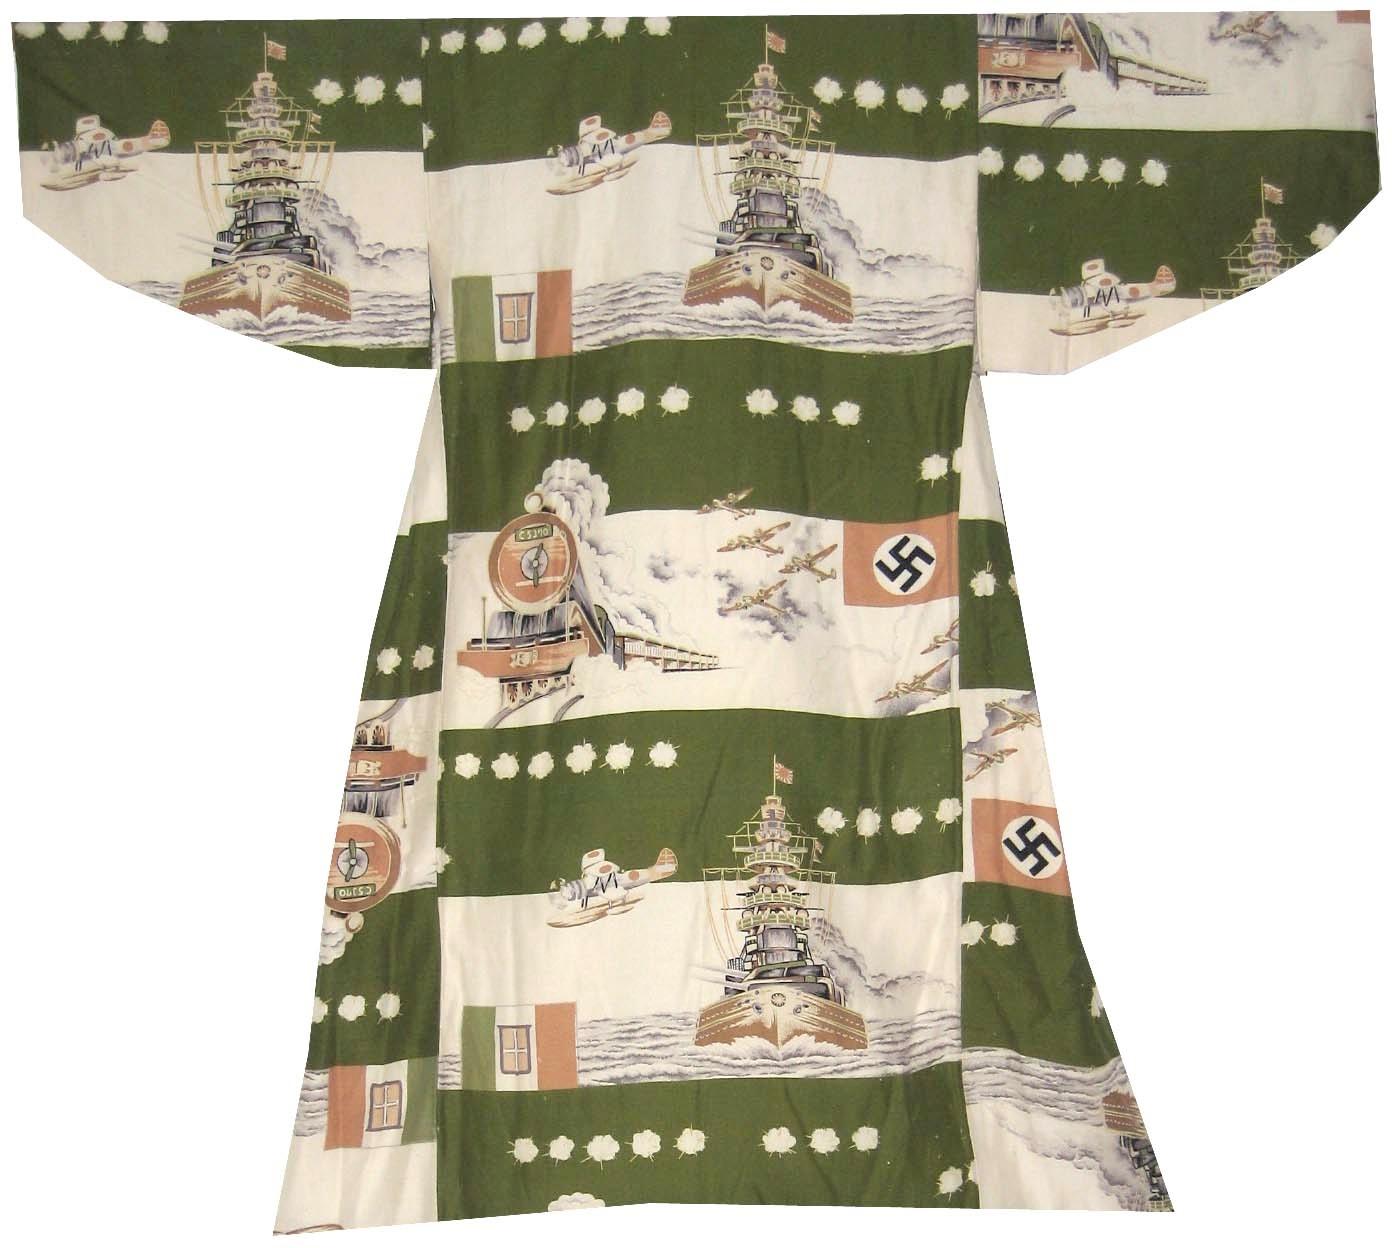 Axis, Boy's Kimono, c. 1940-41, rayon, 29h x 32w in.